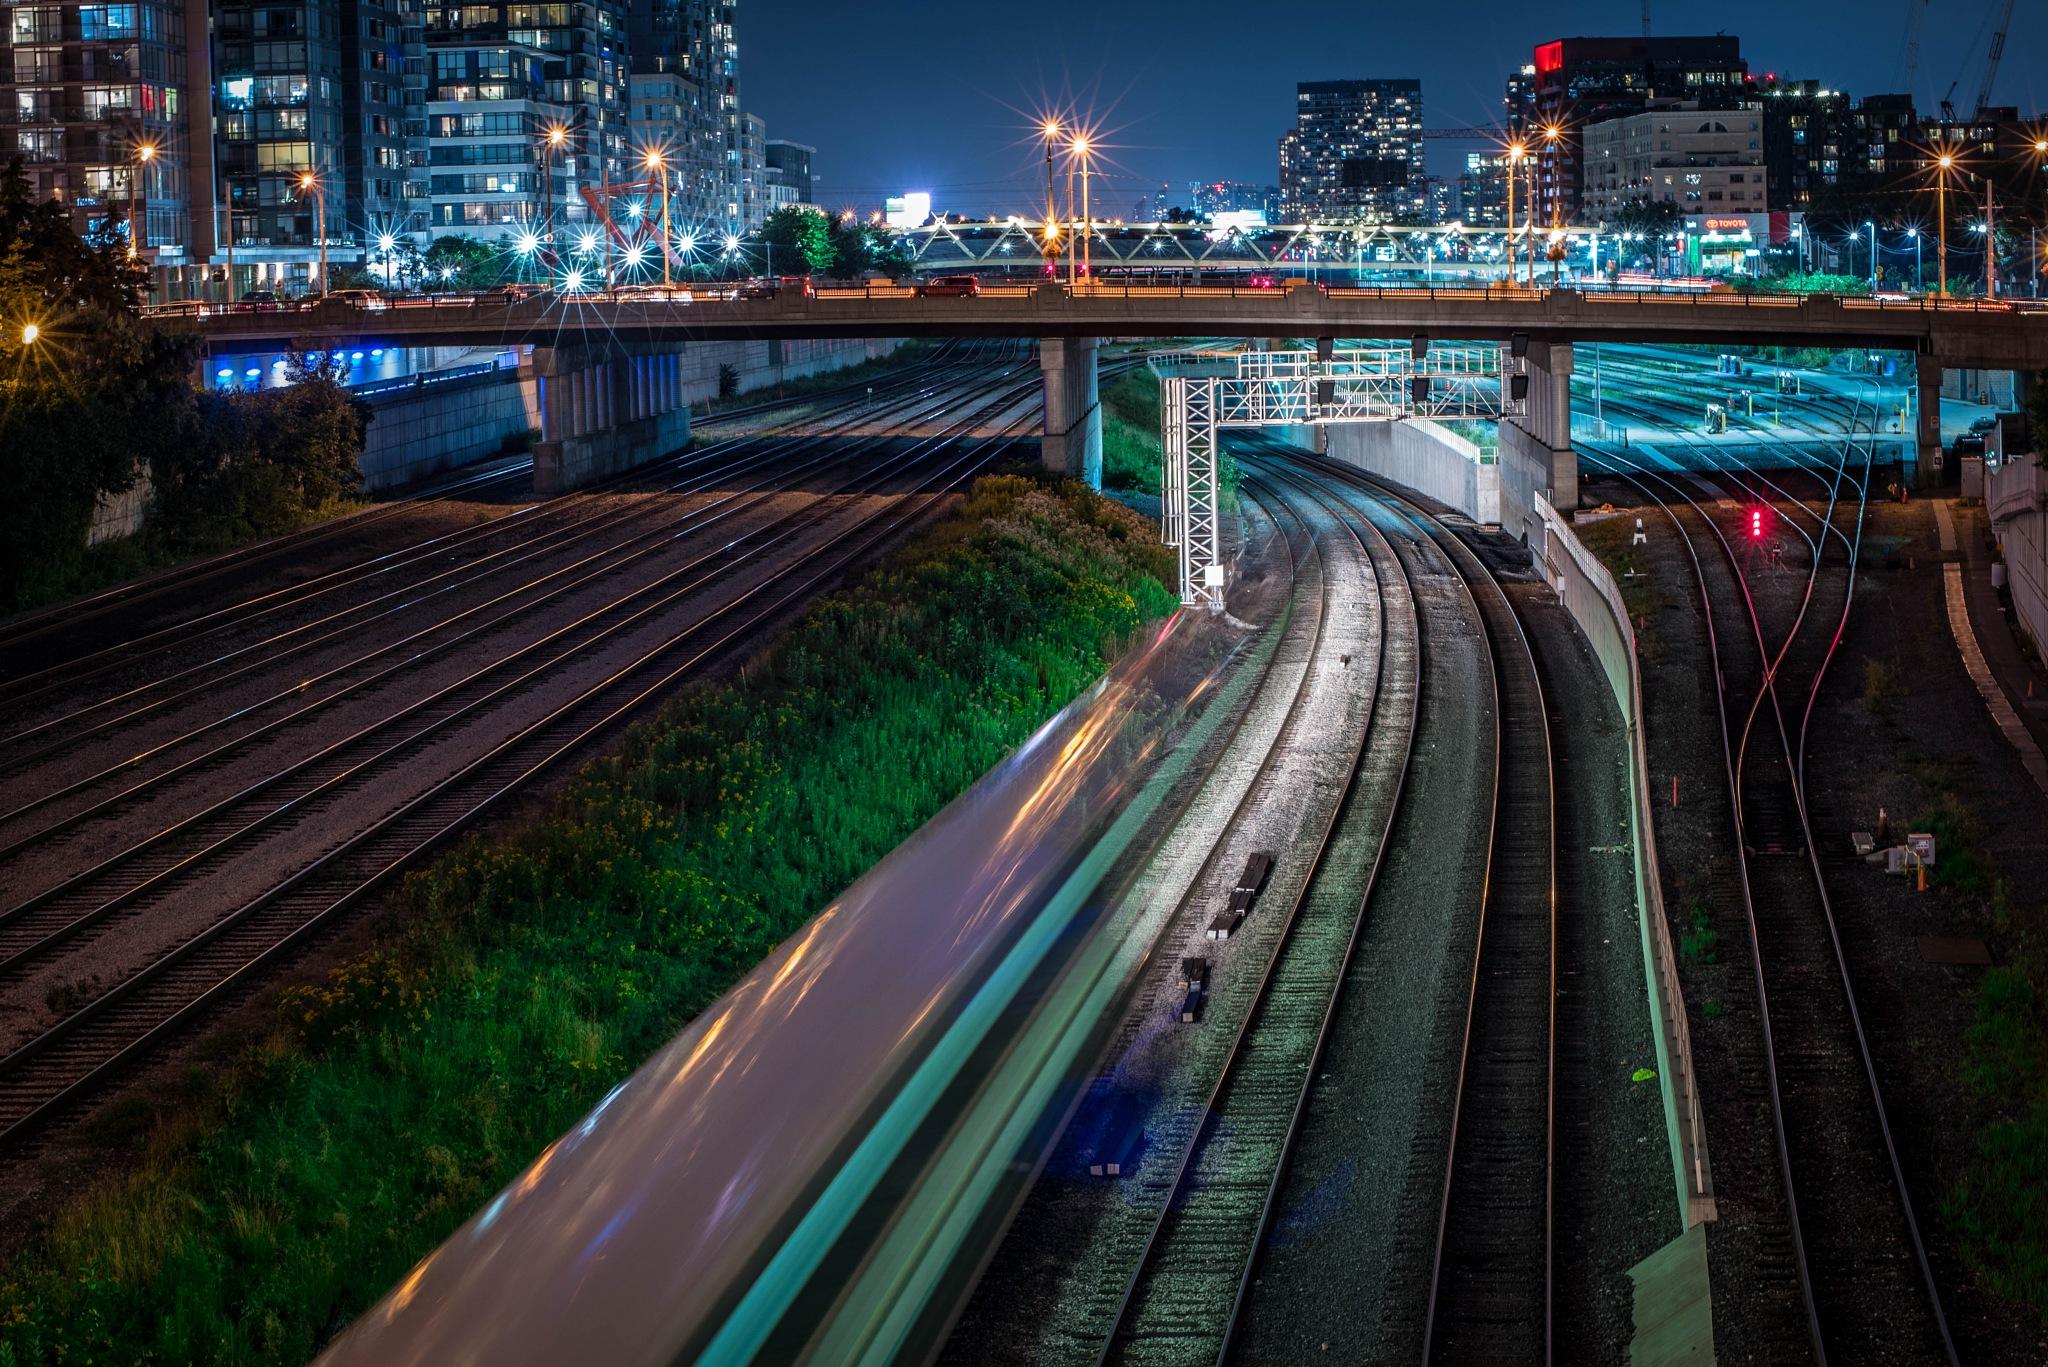 Toronto In-Motion by Kevin Drew Davis